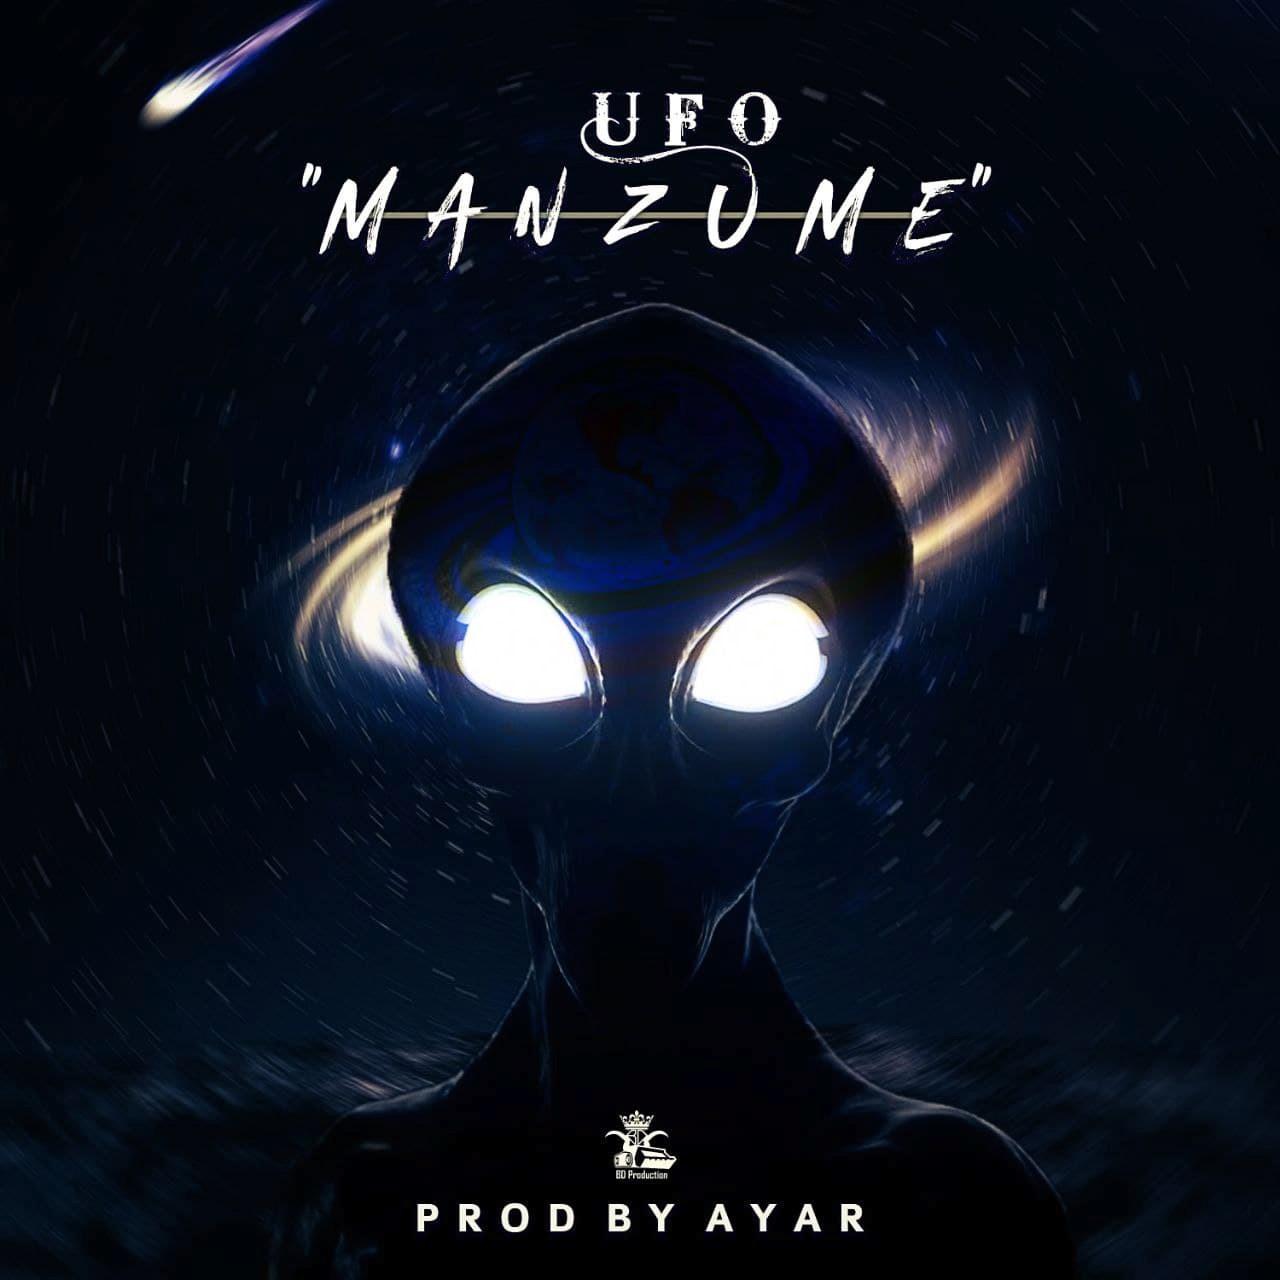 Ufo - Manzume